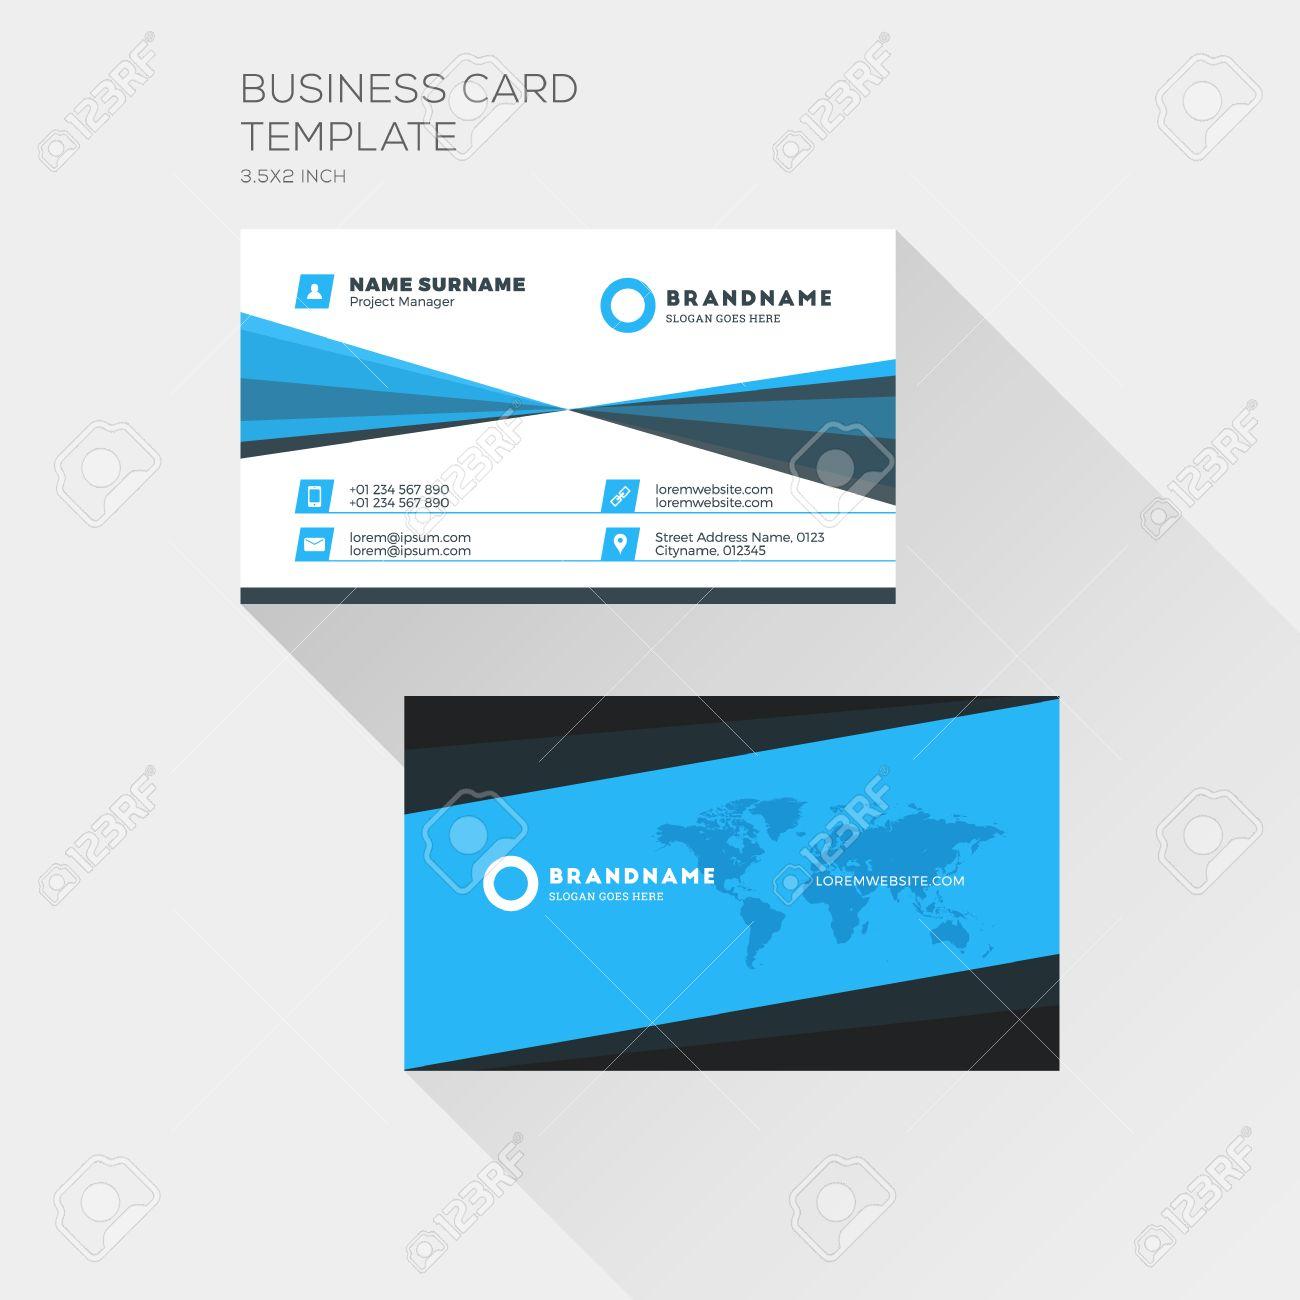 Corporate business card print template personal visiting card corporate business card print template personal visiting card with company logo clean flat design magicingreecefo Gallery